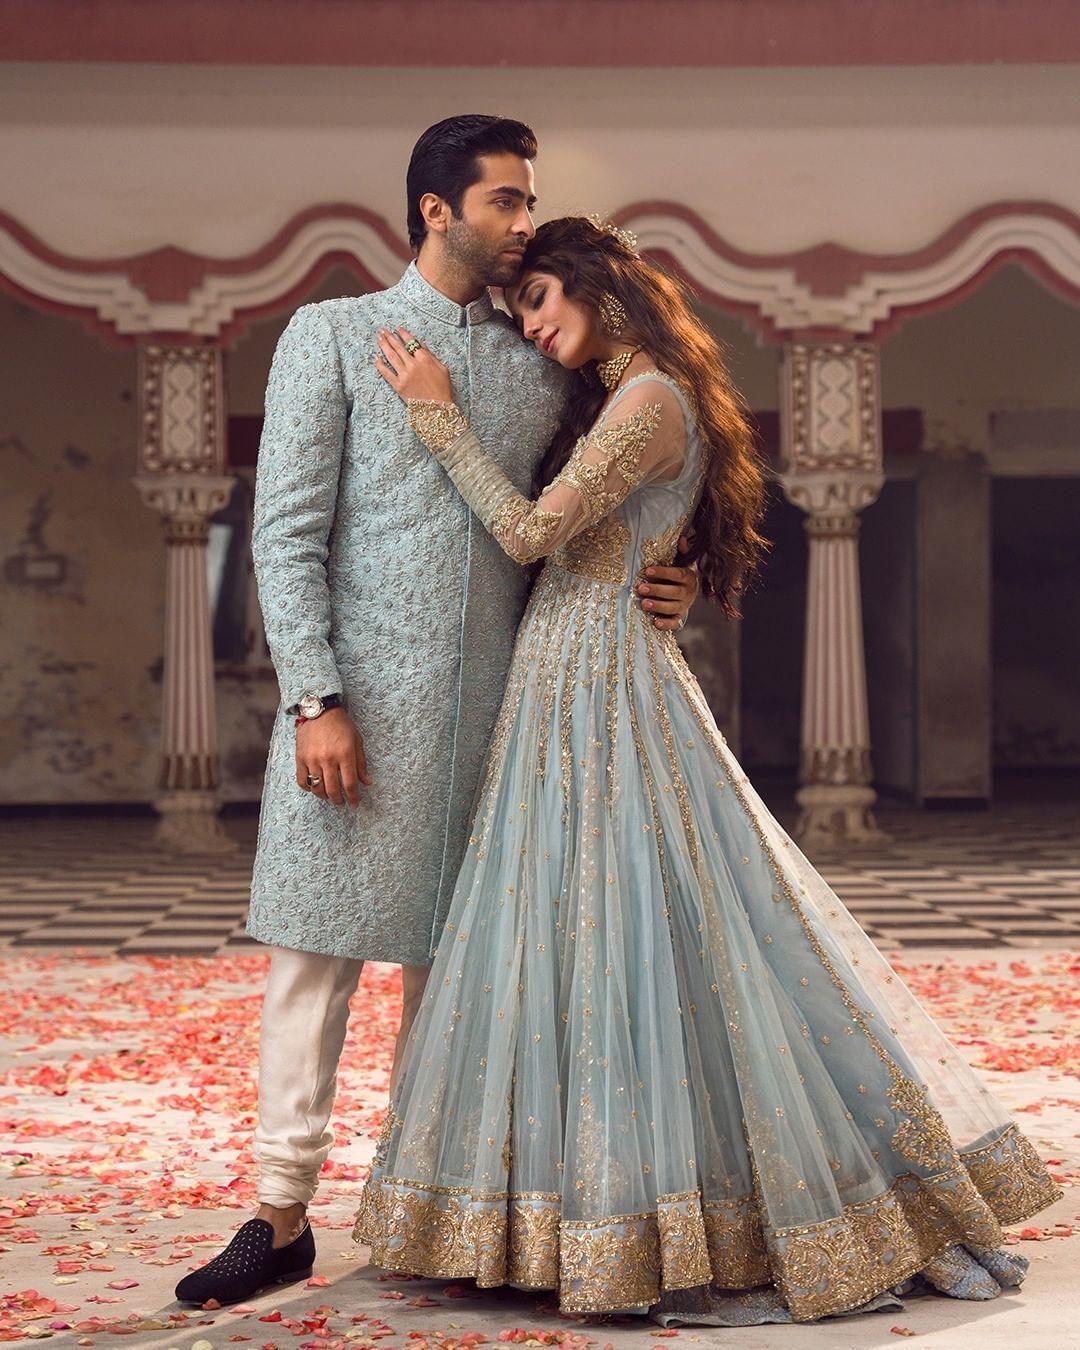 Maya Ali and Sheheryar Munawar pictures